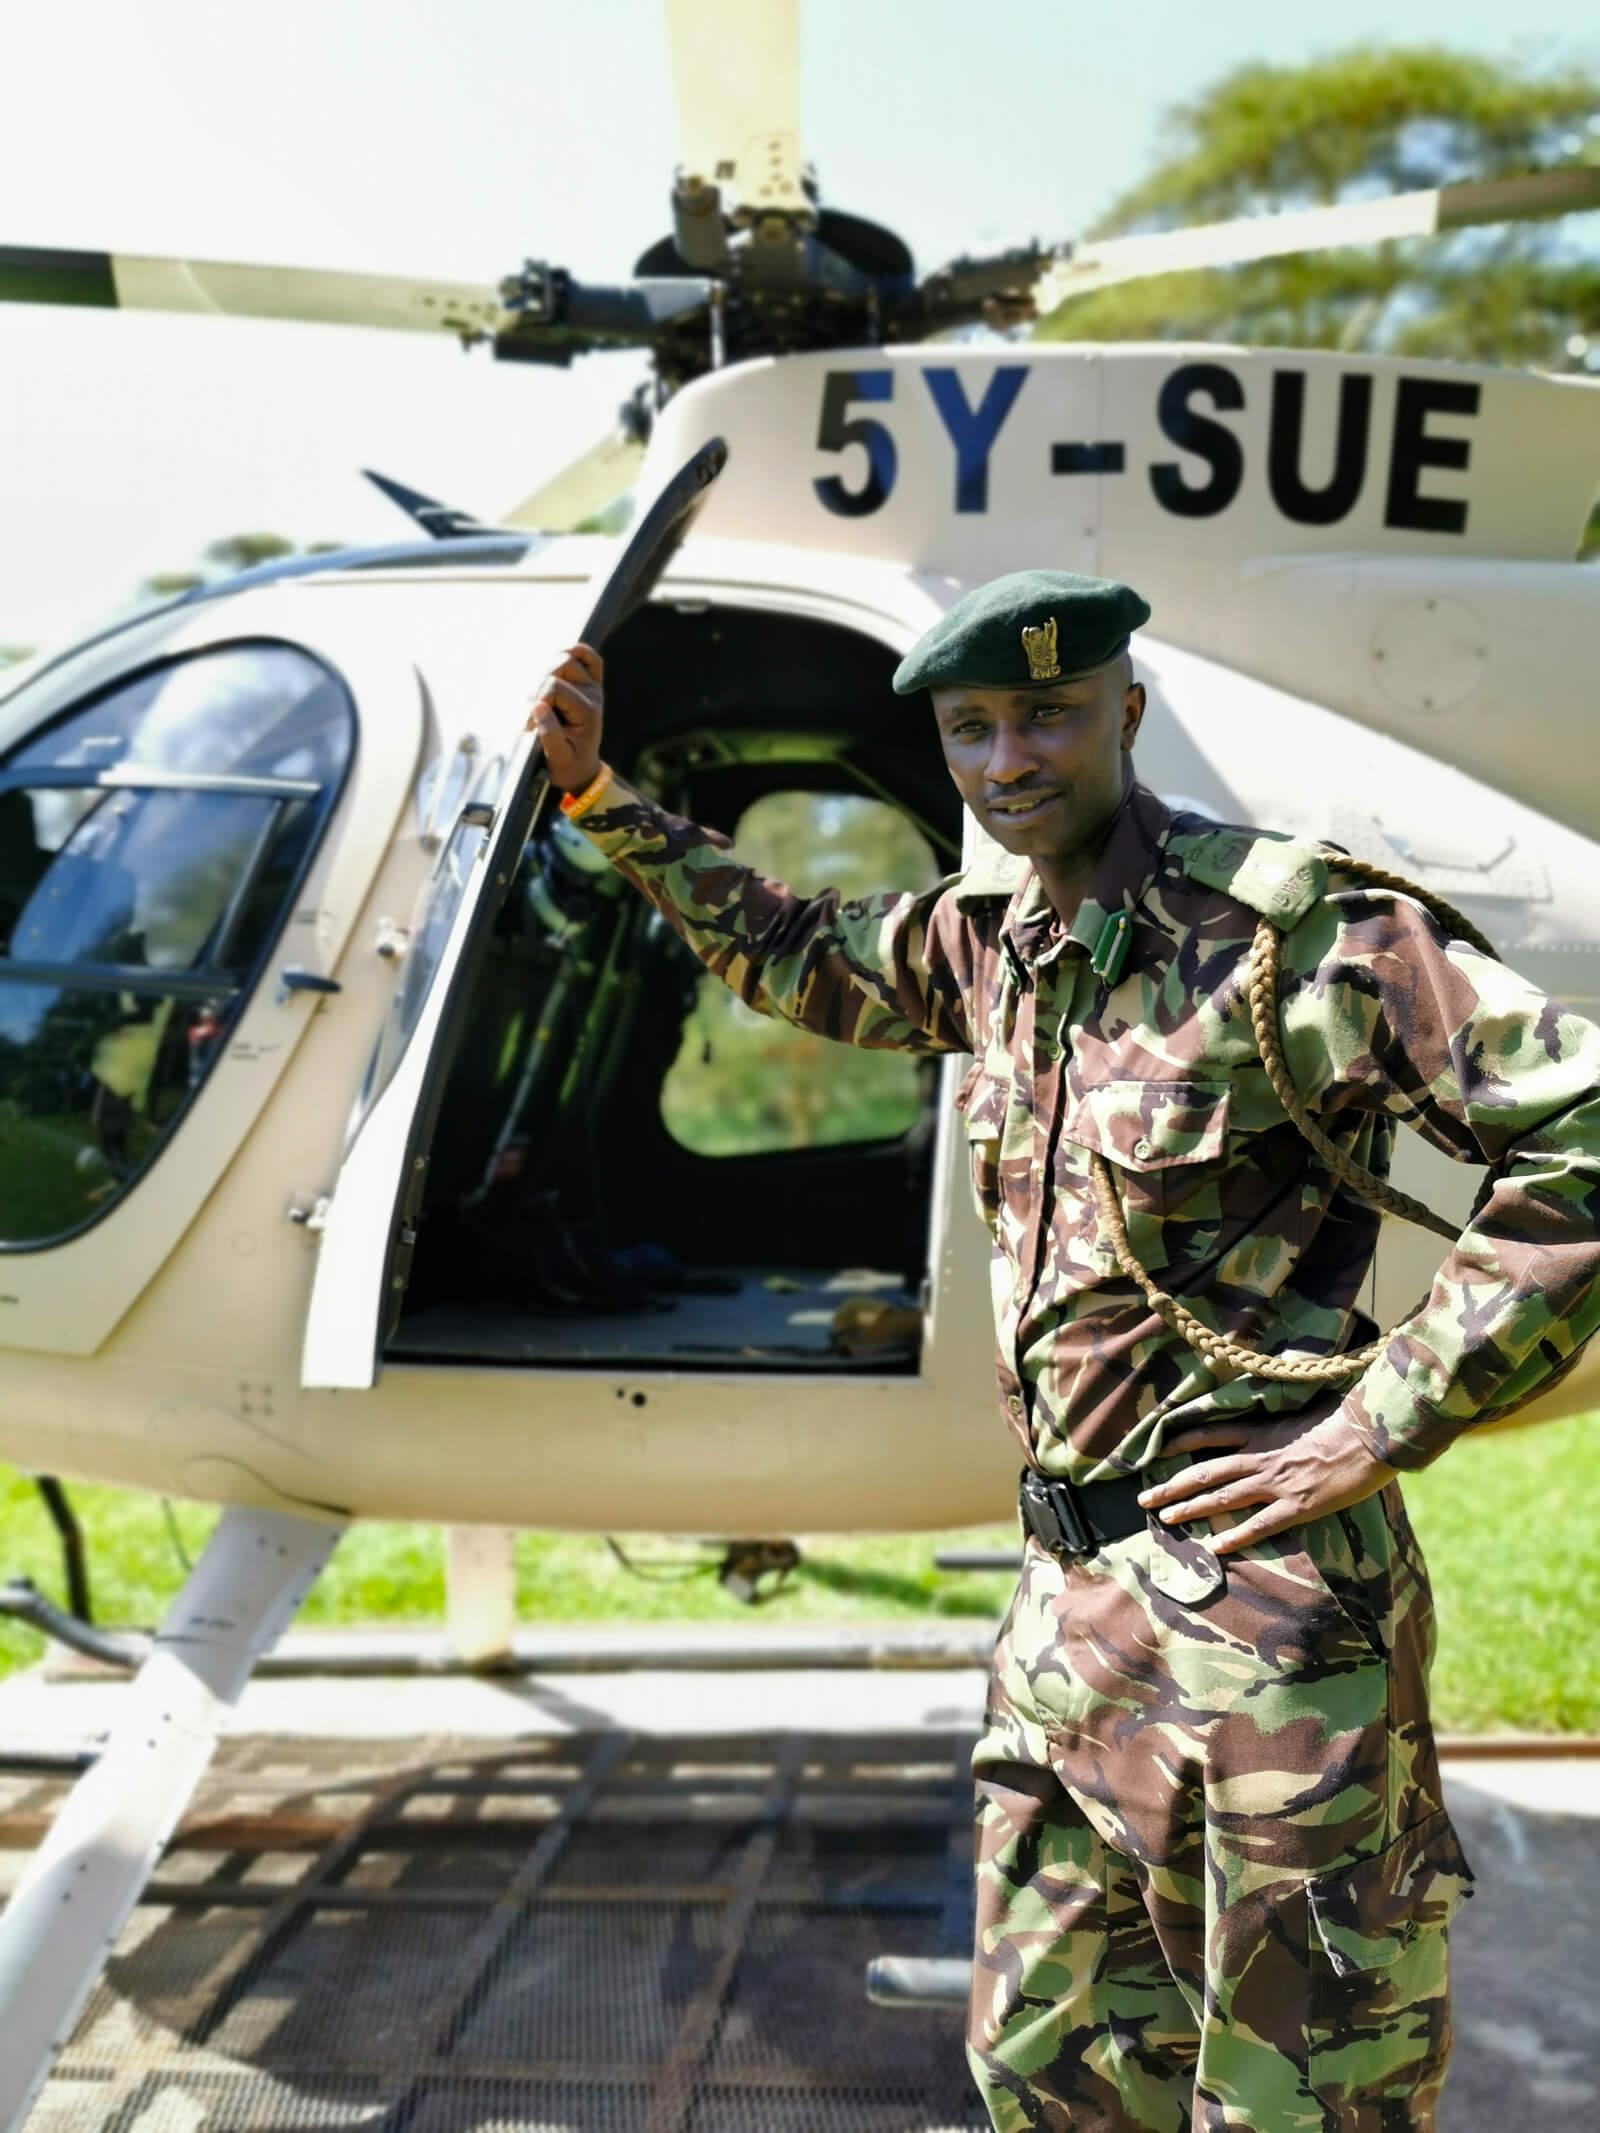 Lewa - Anti-Poaching Helicopter